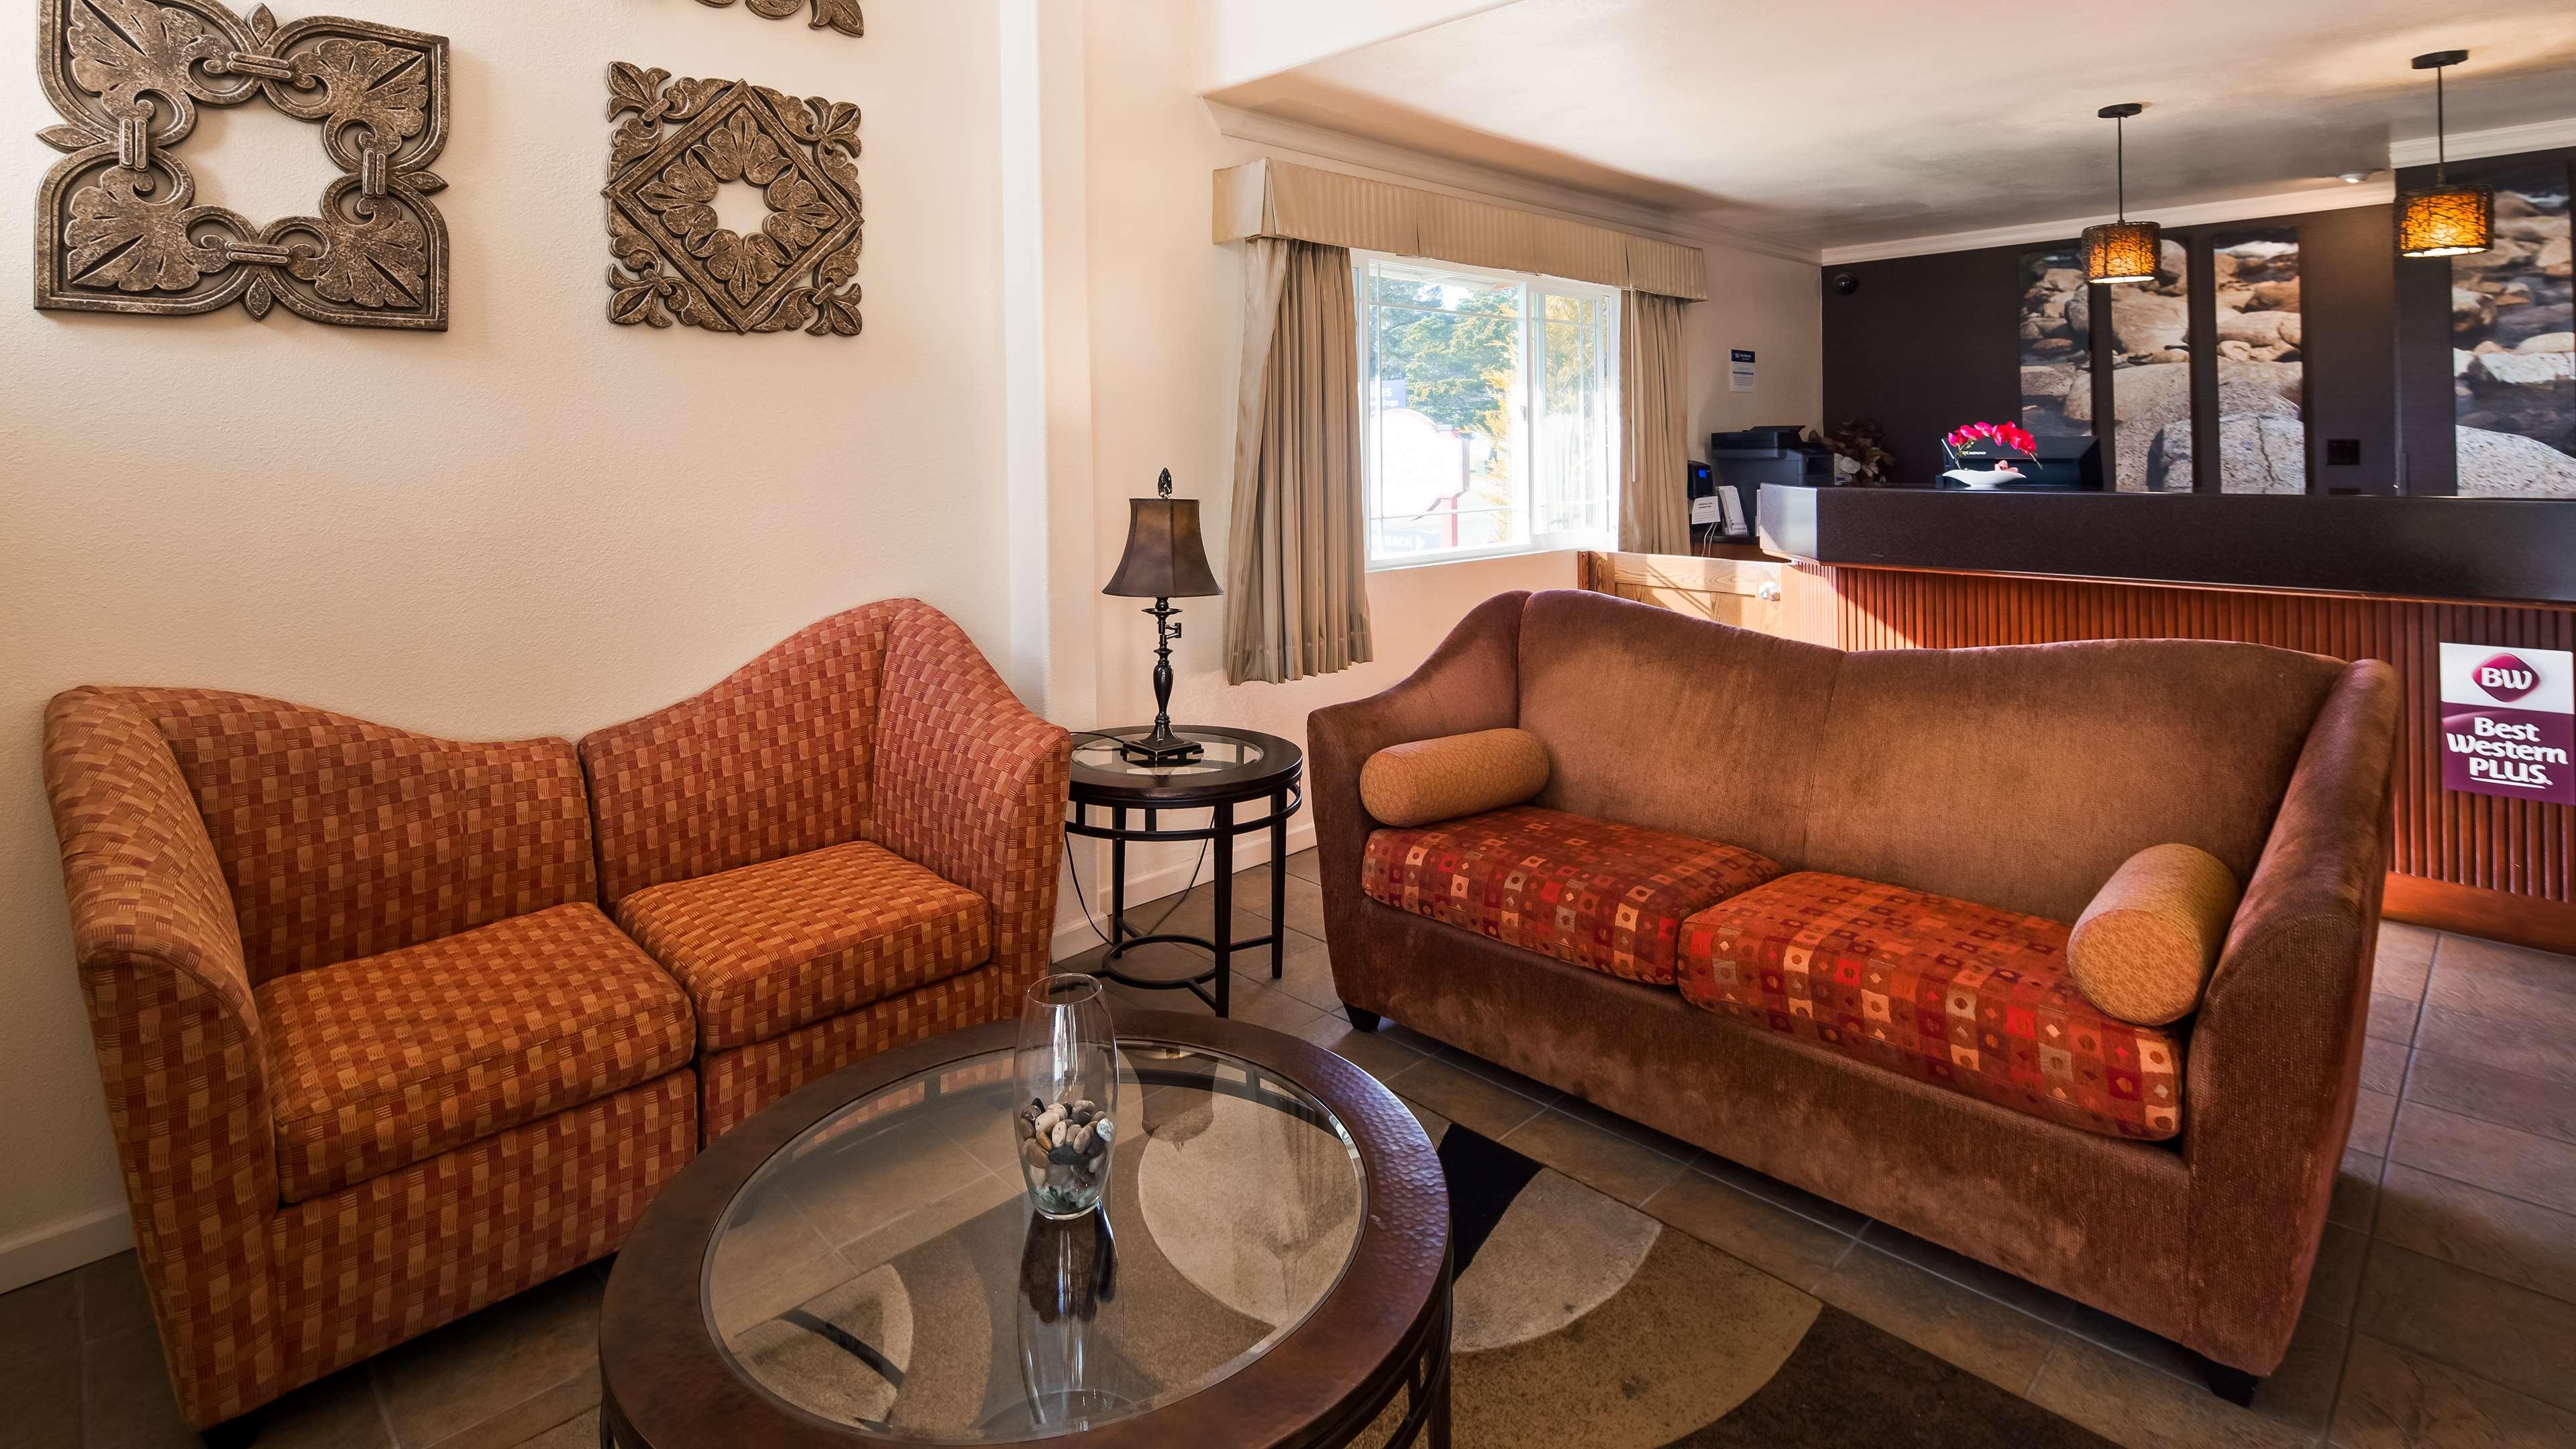 Best Western Plus Northwoods Inn - Crescent City, CA